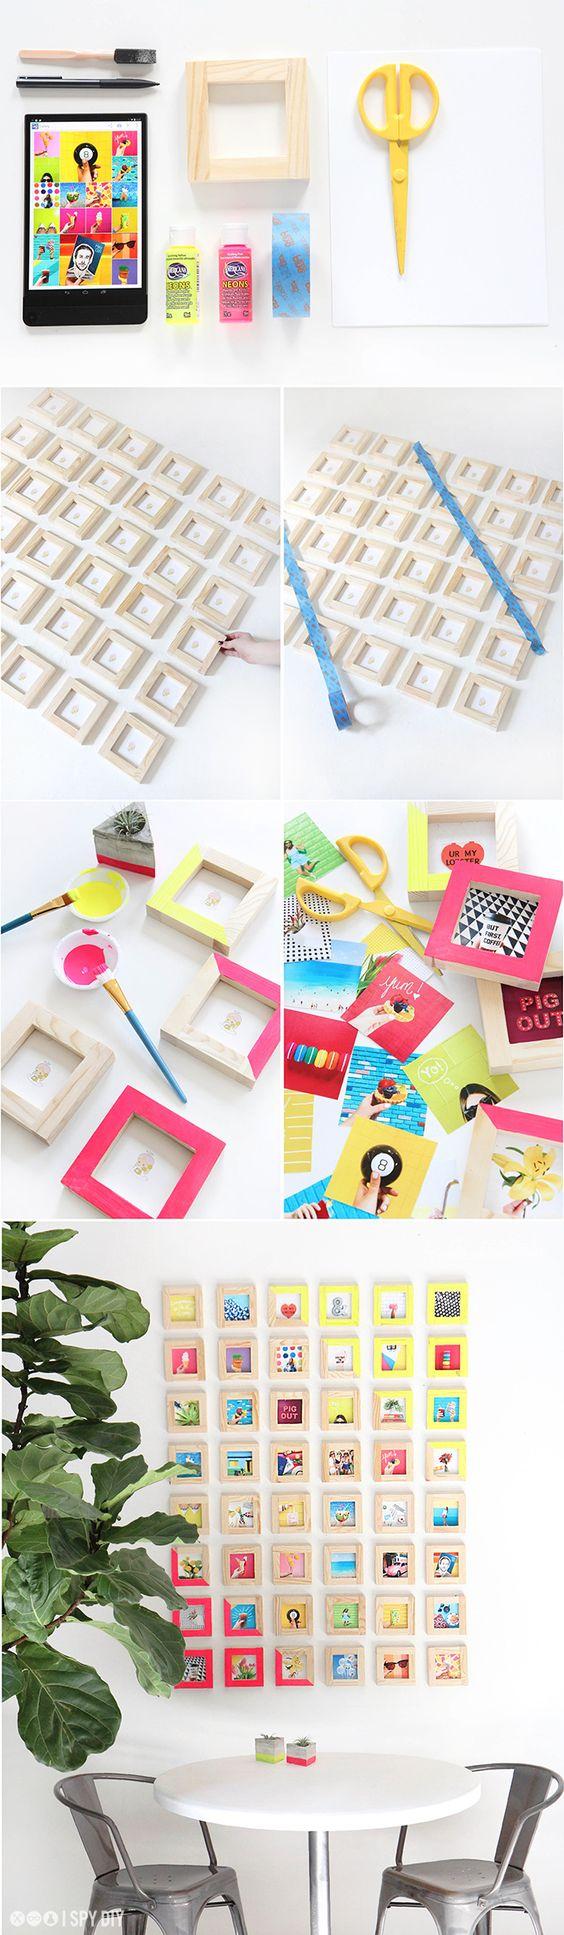 Ideas para colocar fotos - marcos de madera